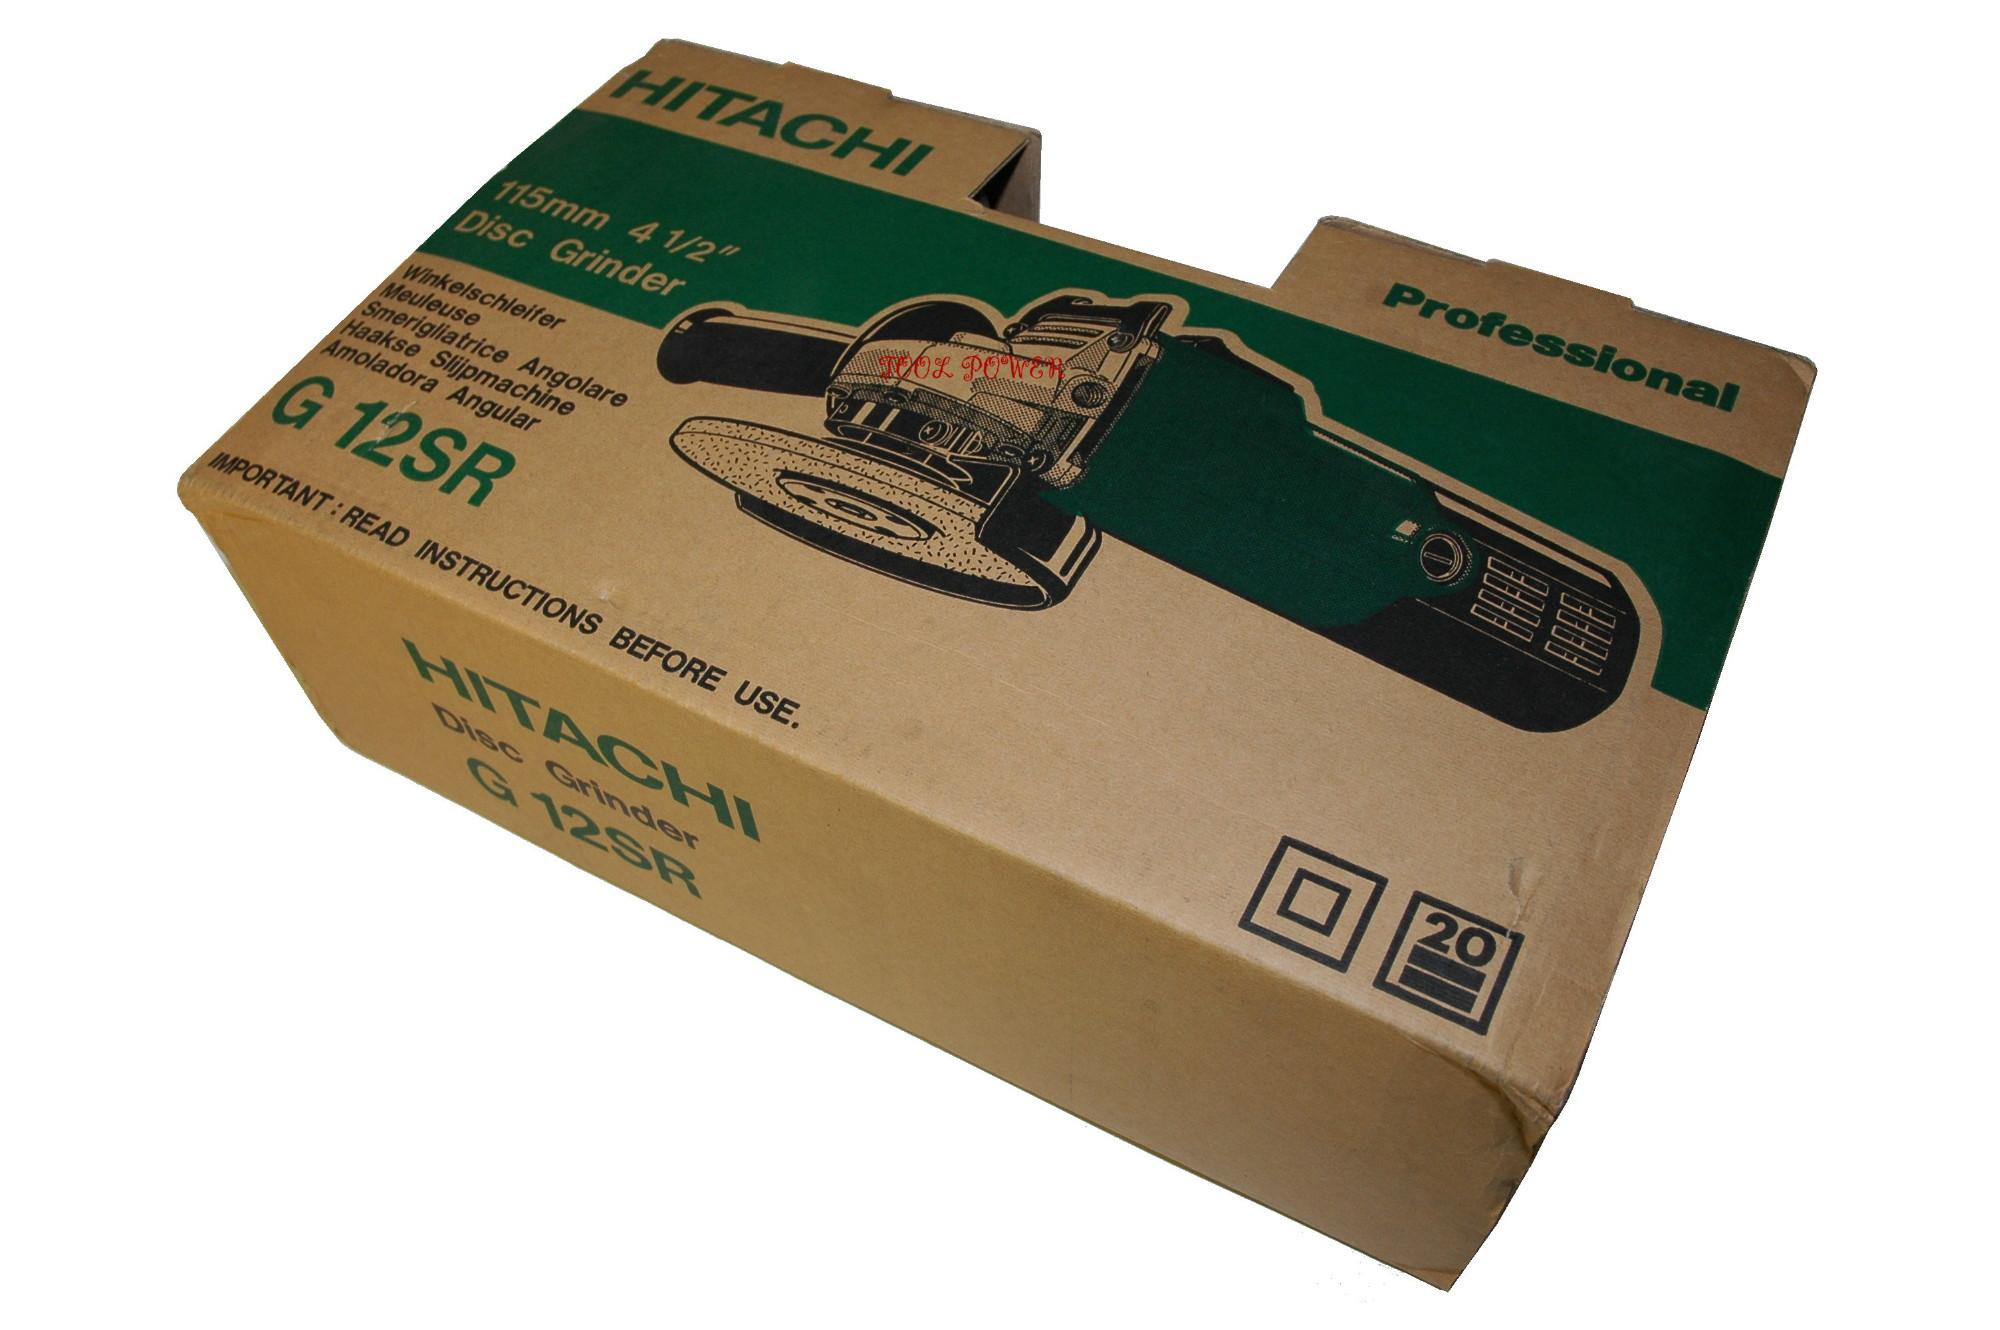 Hitachi grinder parts Australia